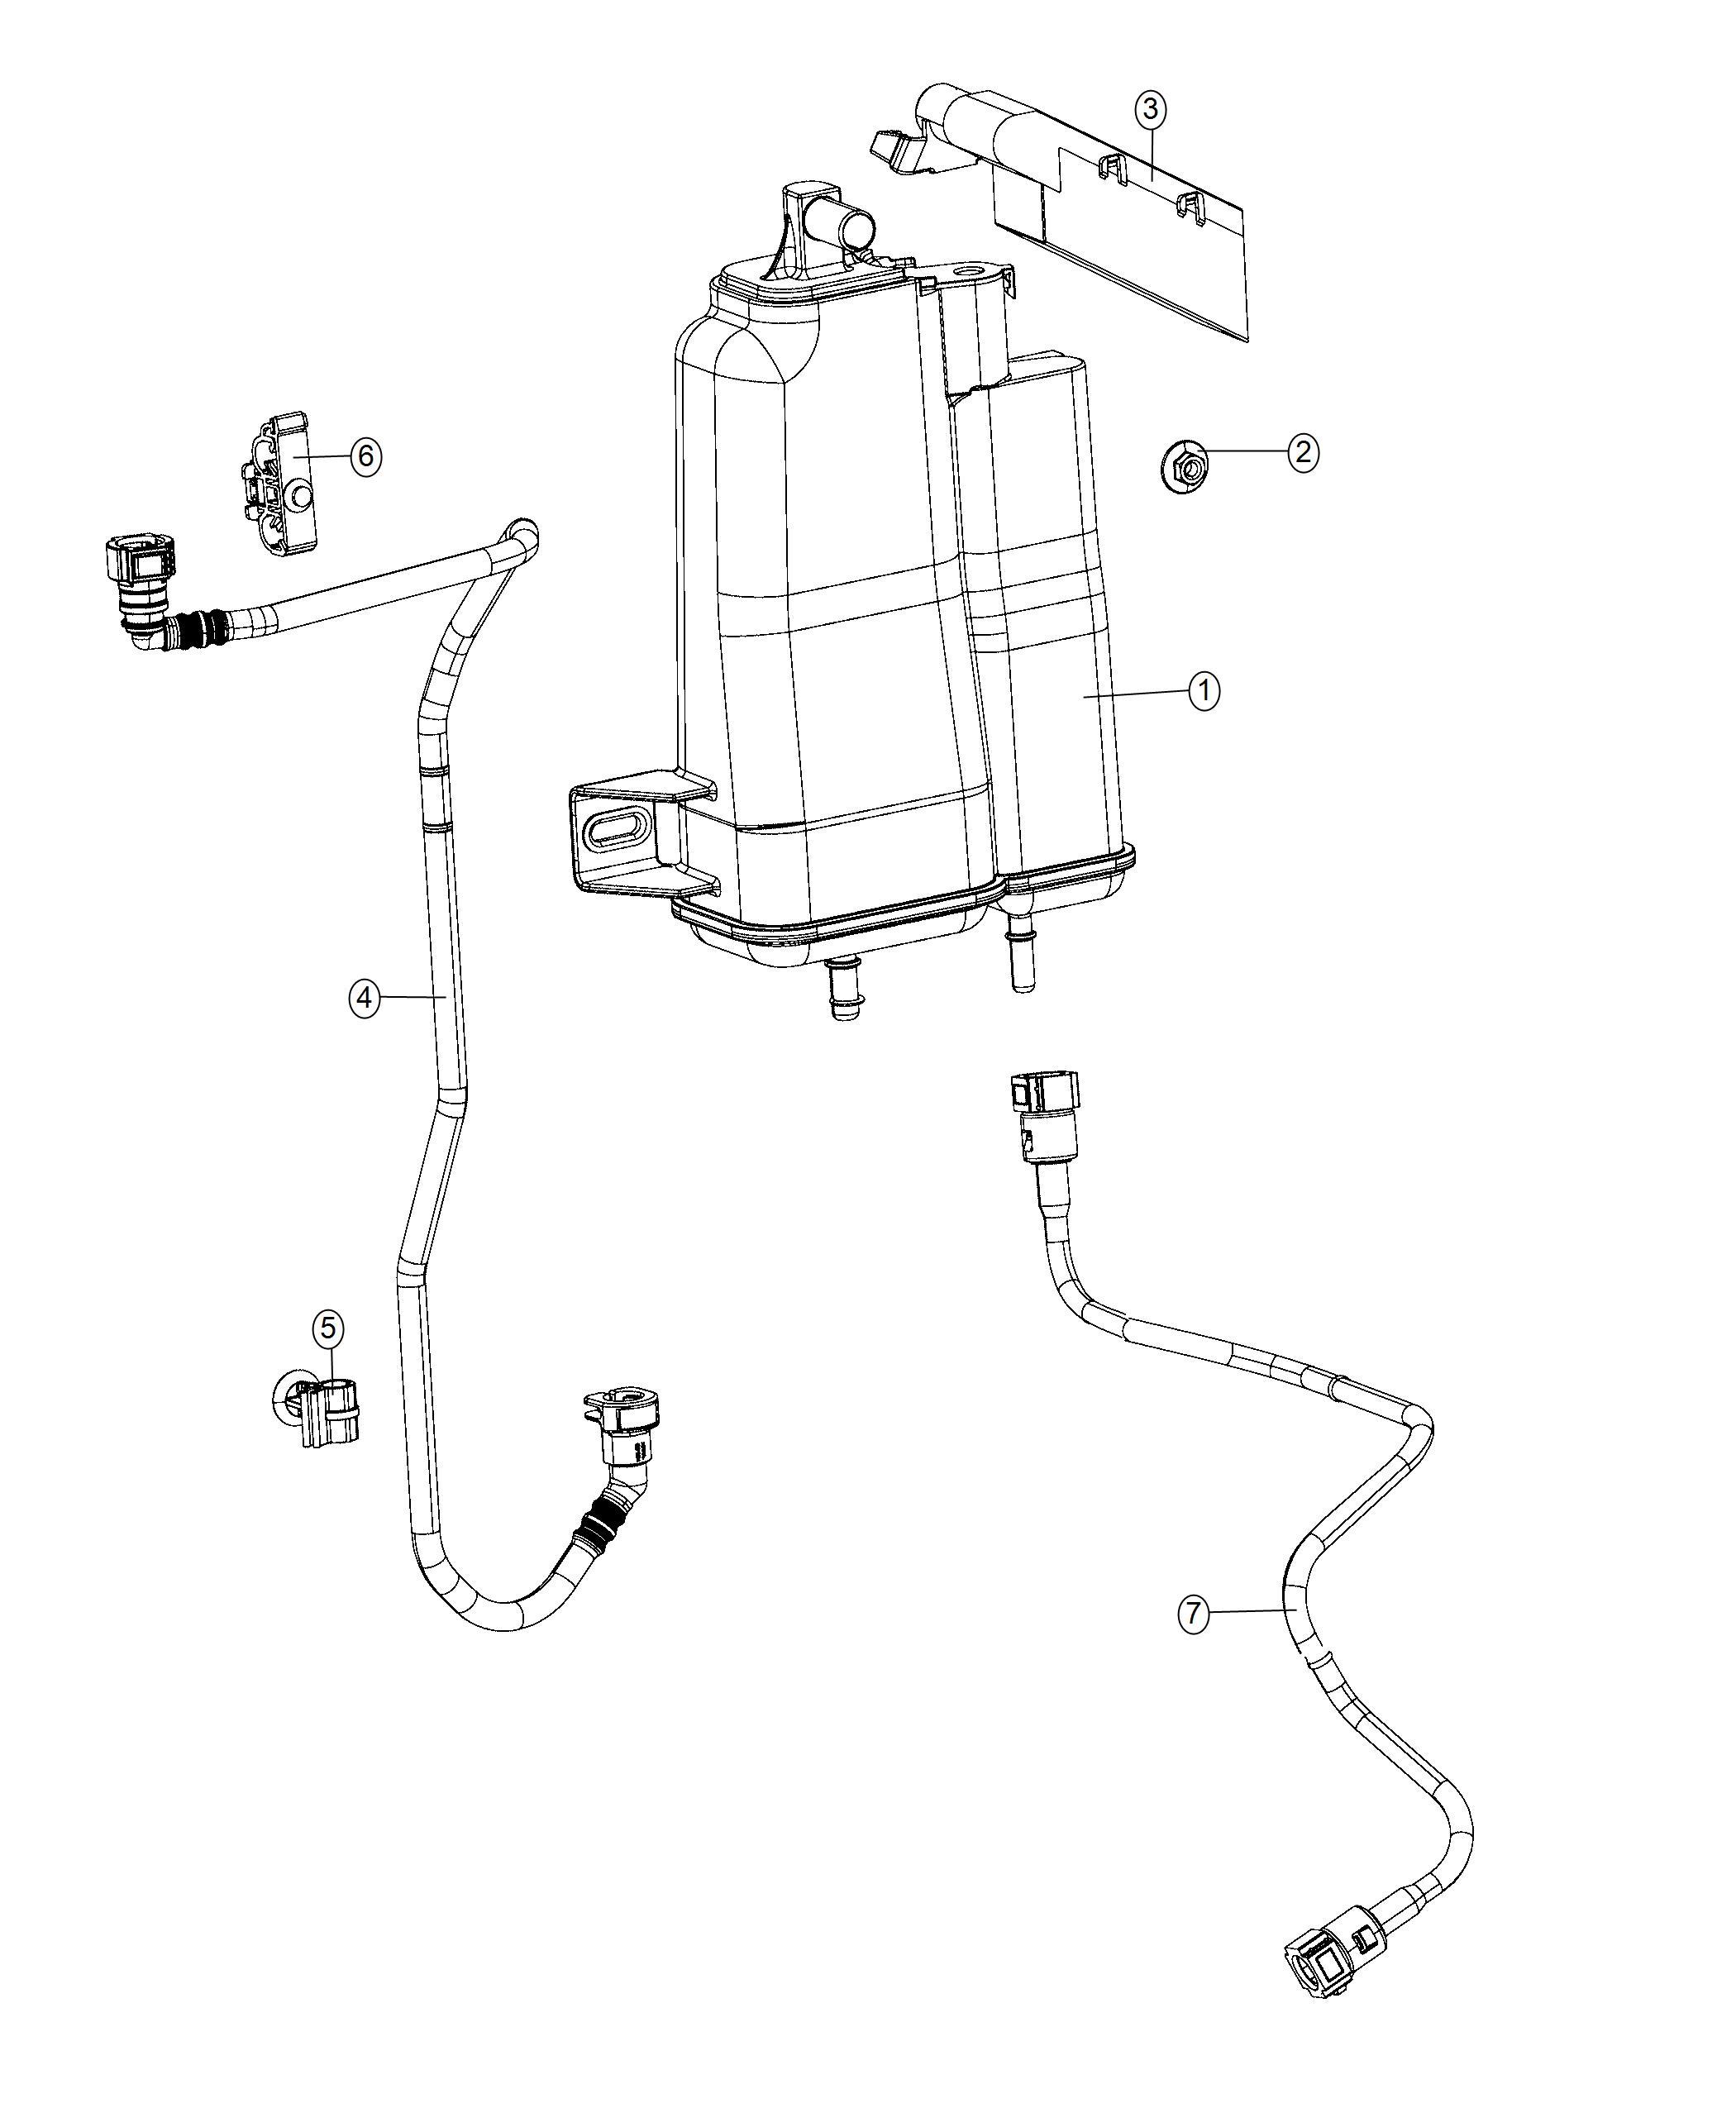 Jeep Renegade Canister Vapor Zero Evaporate Emissions